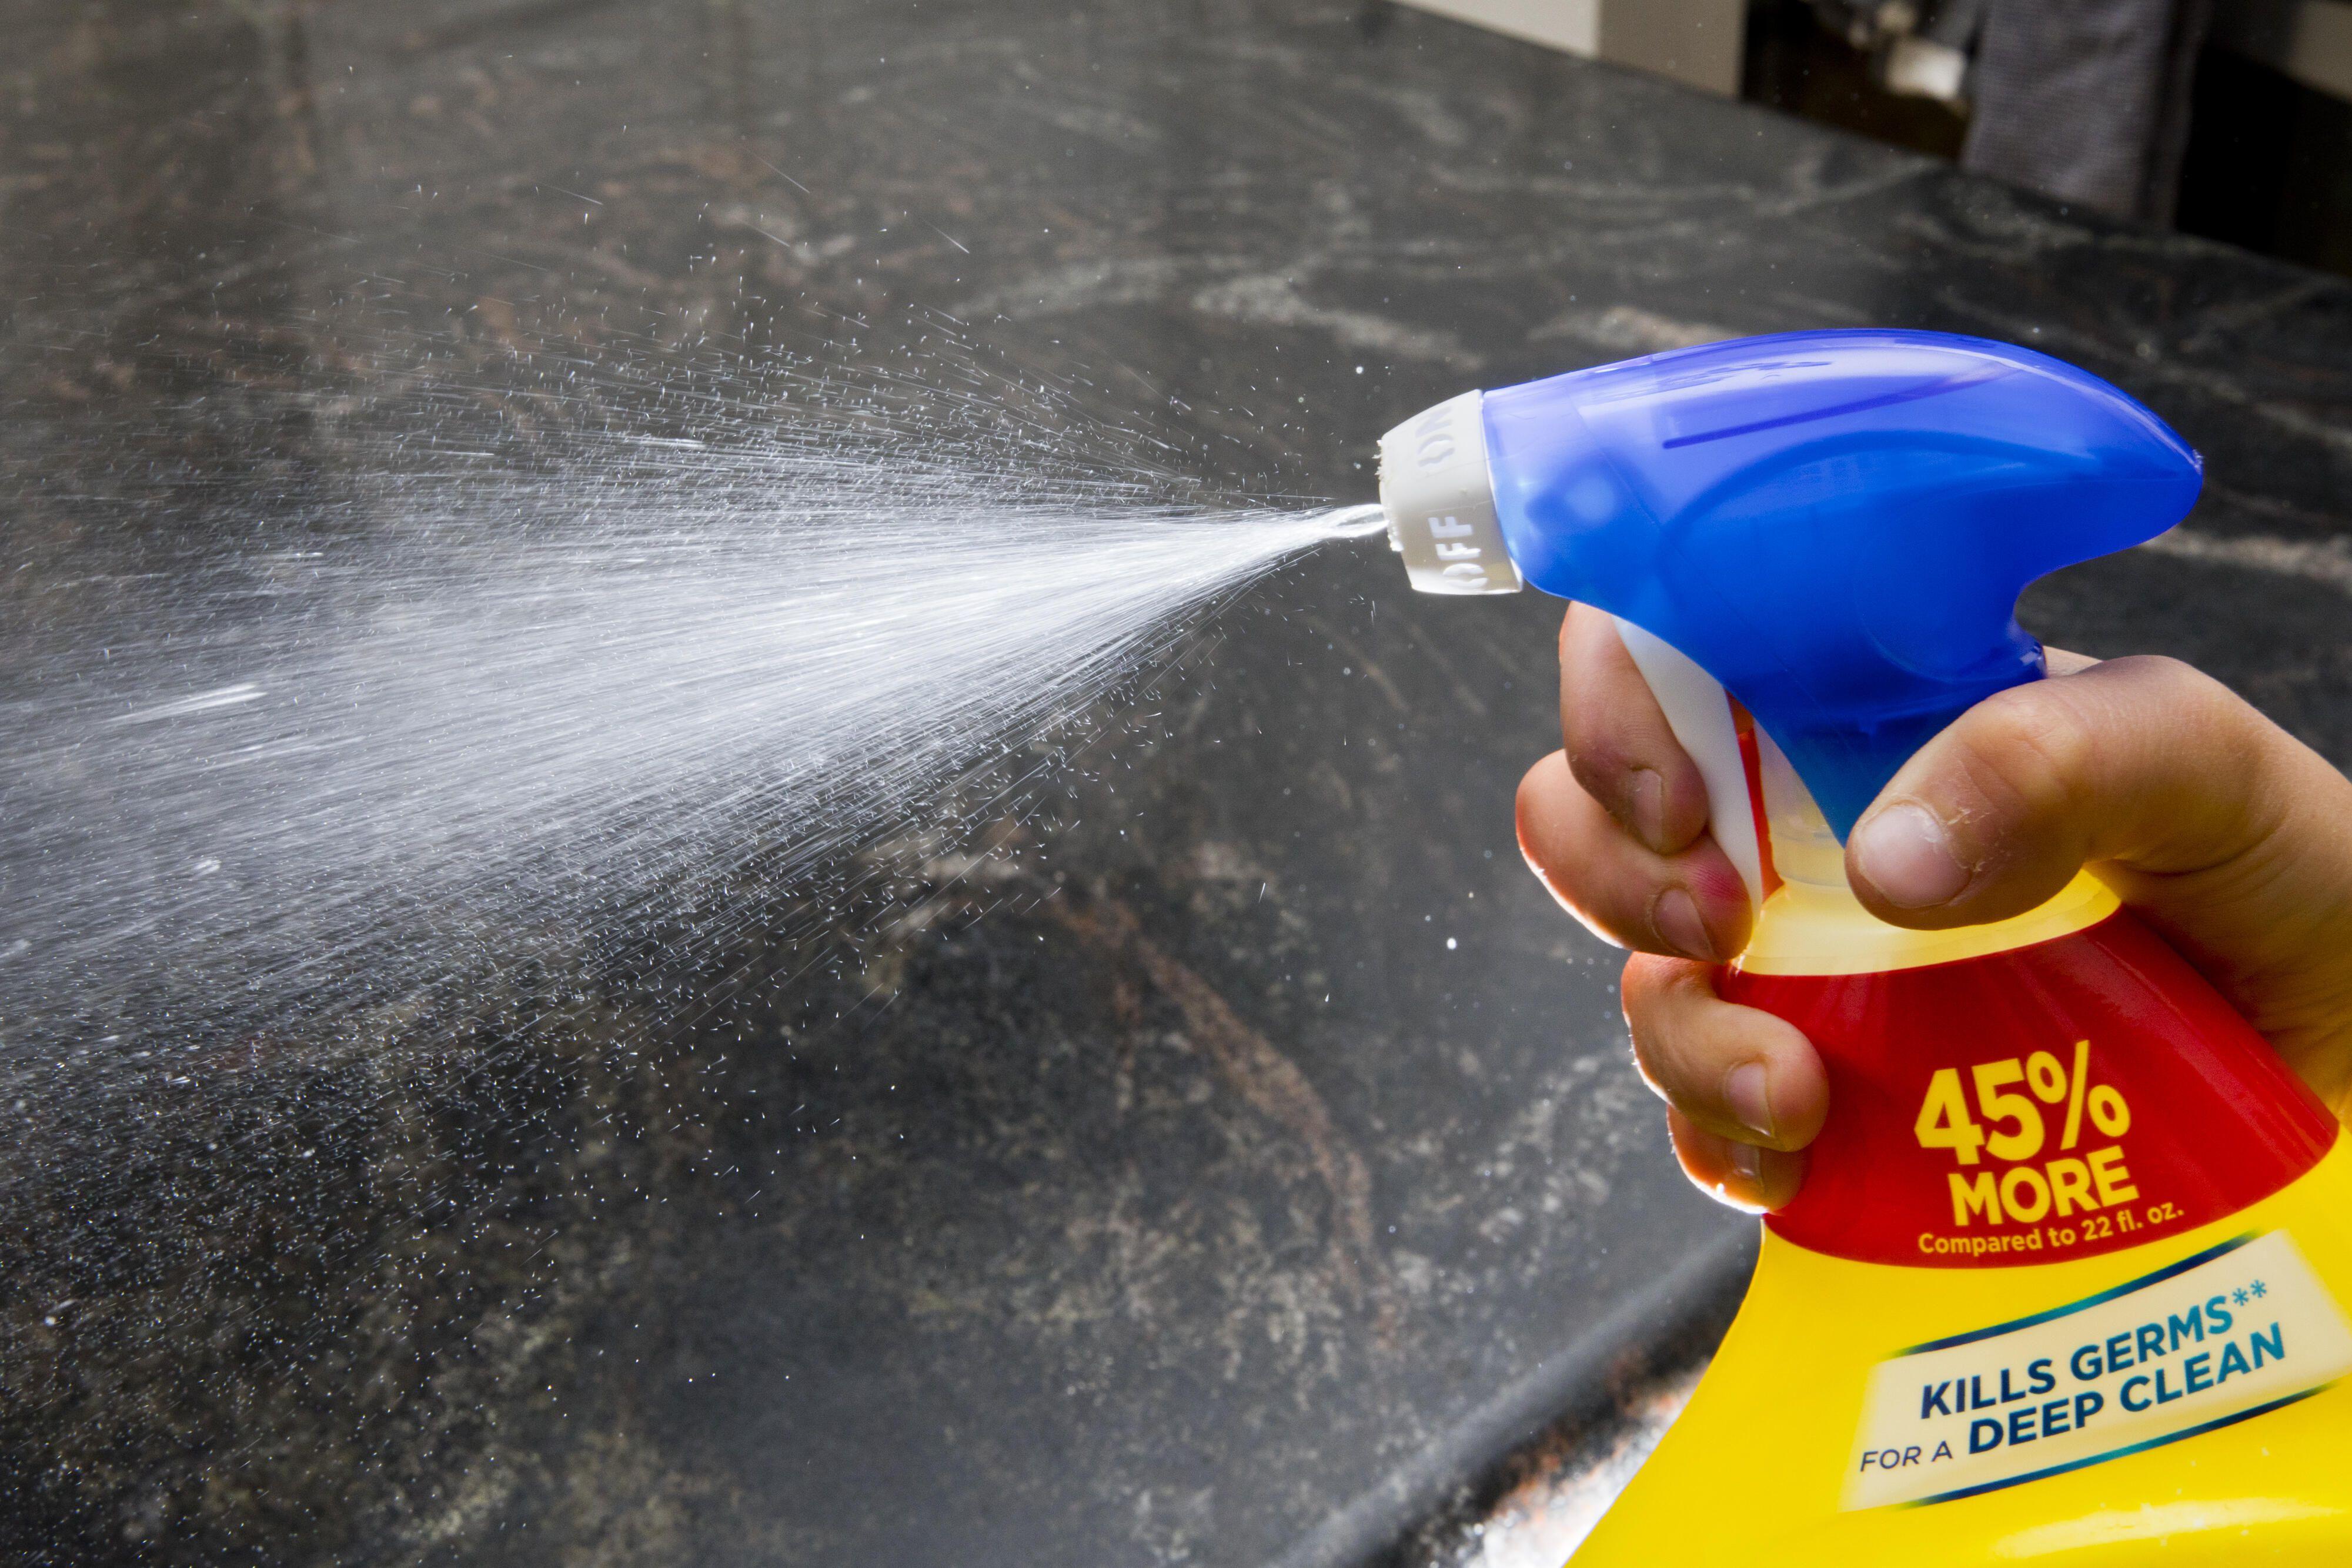 coronavirus-cleaning-kitchen-spray-disinfectant-6620